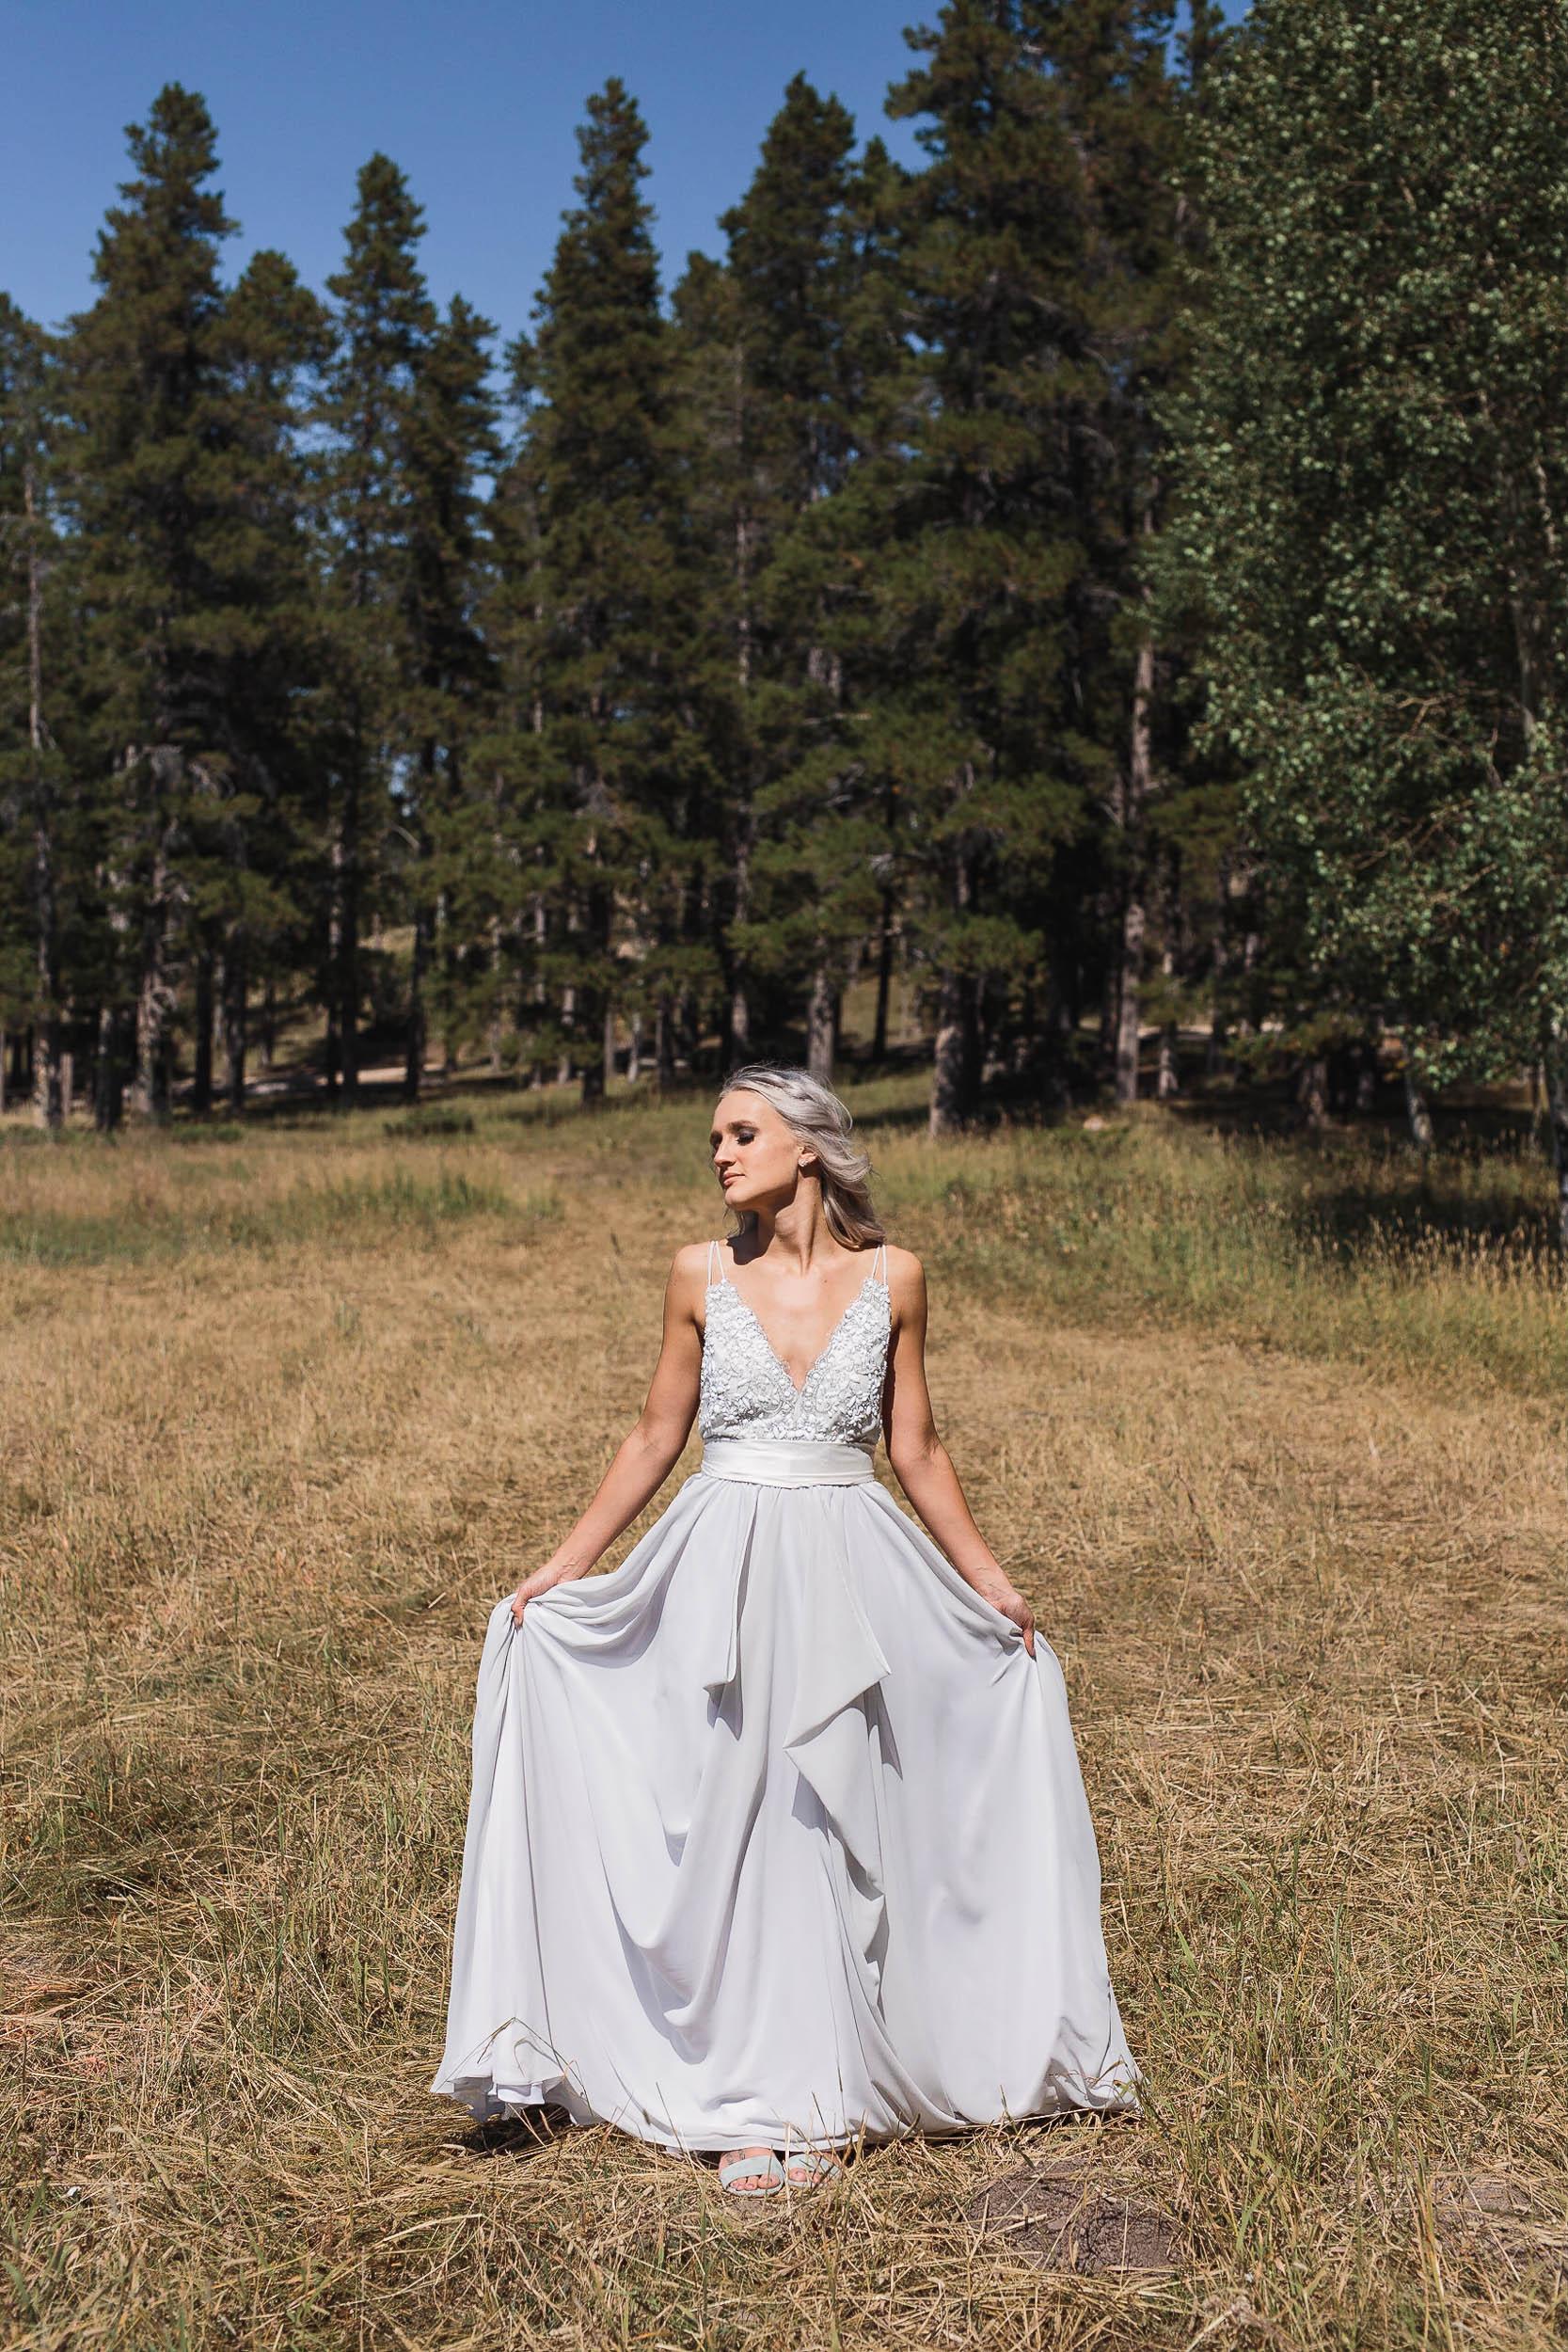 A and Be Bridal Shop Dress wedding portraits at high noon